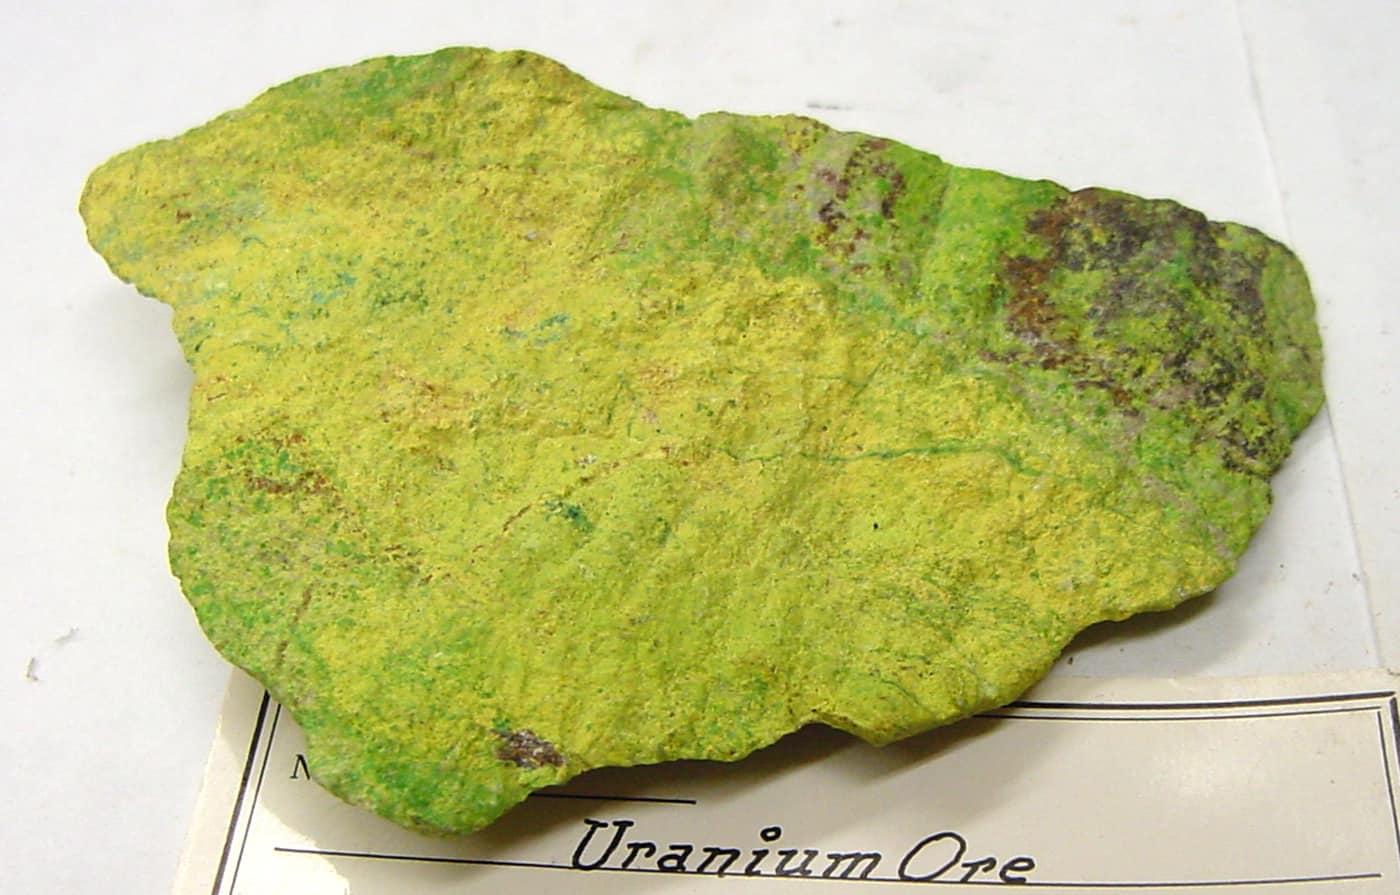 Uranium Ore via Wikimedia